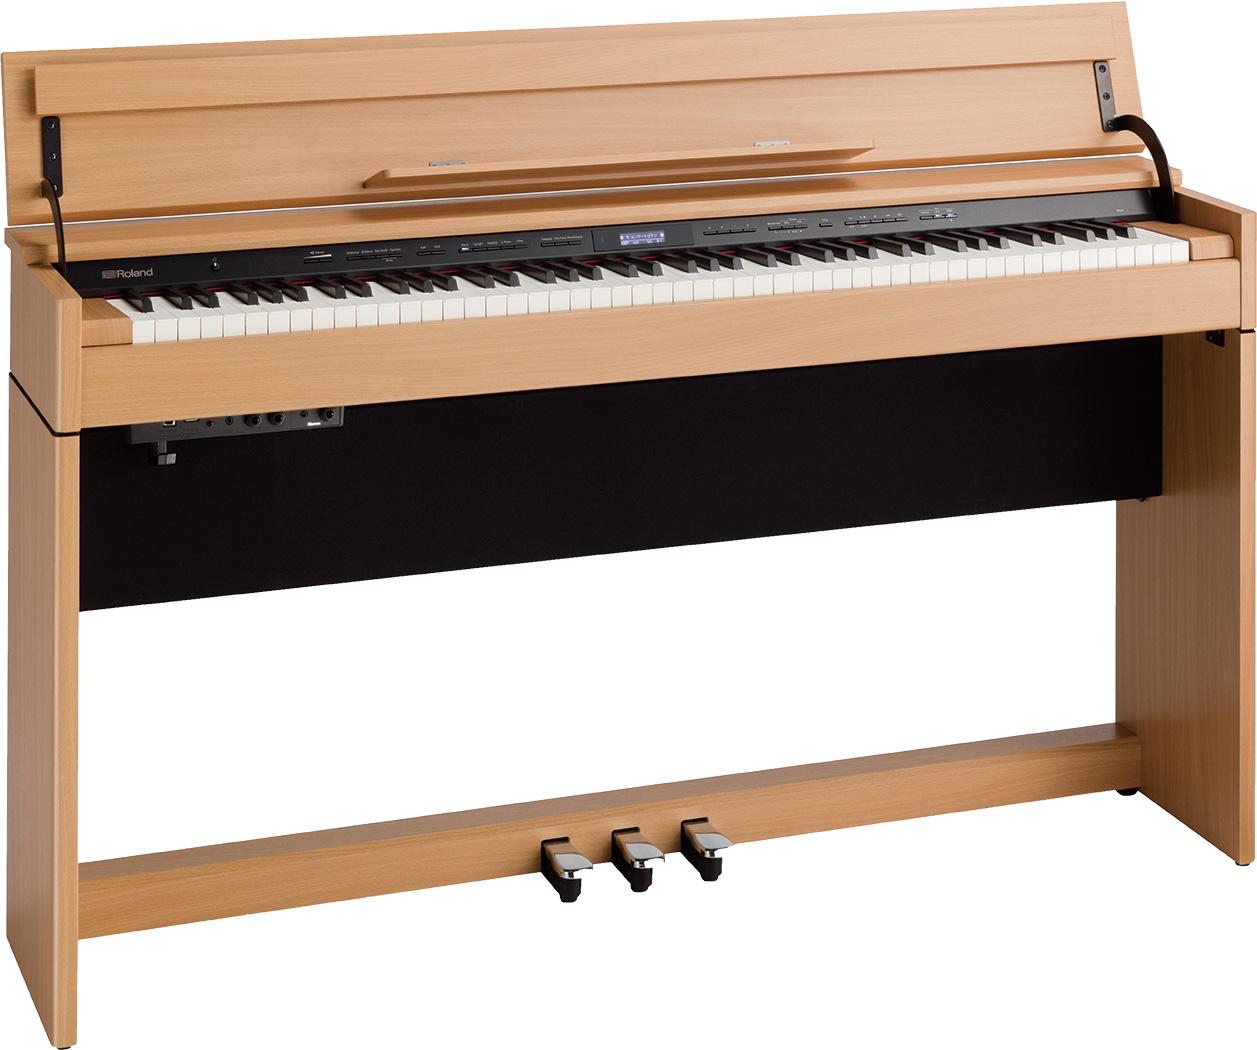 Roland DP603 NBS ナチュラルビーチ調仕上げ Digital Piano 新品 電子ピアノ[ローランド][Natural][Digital Piano,デジタル,エレピ][DP-603][動画]